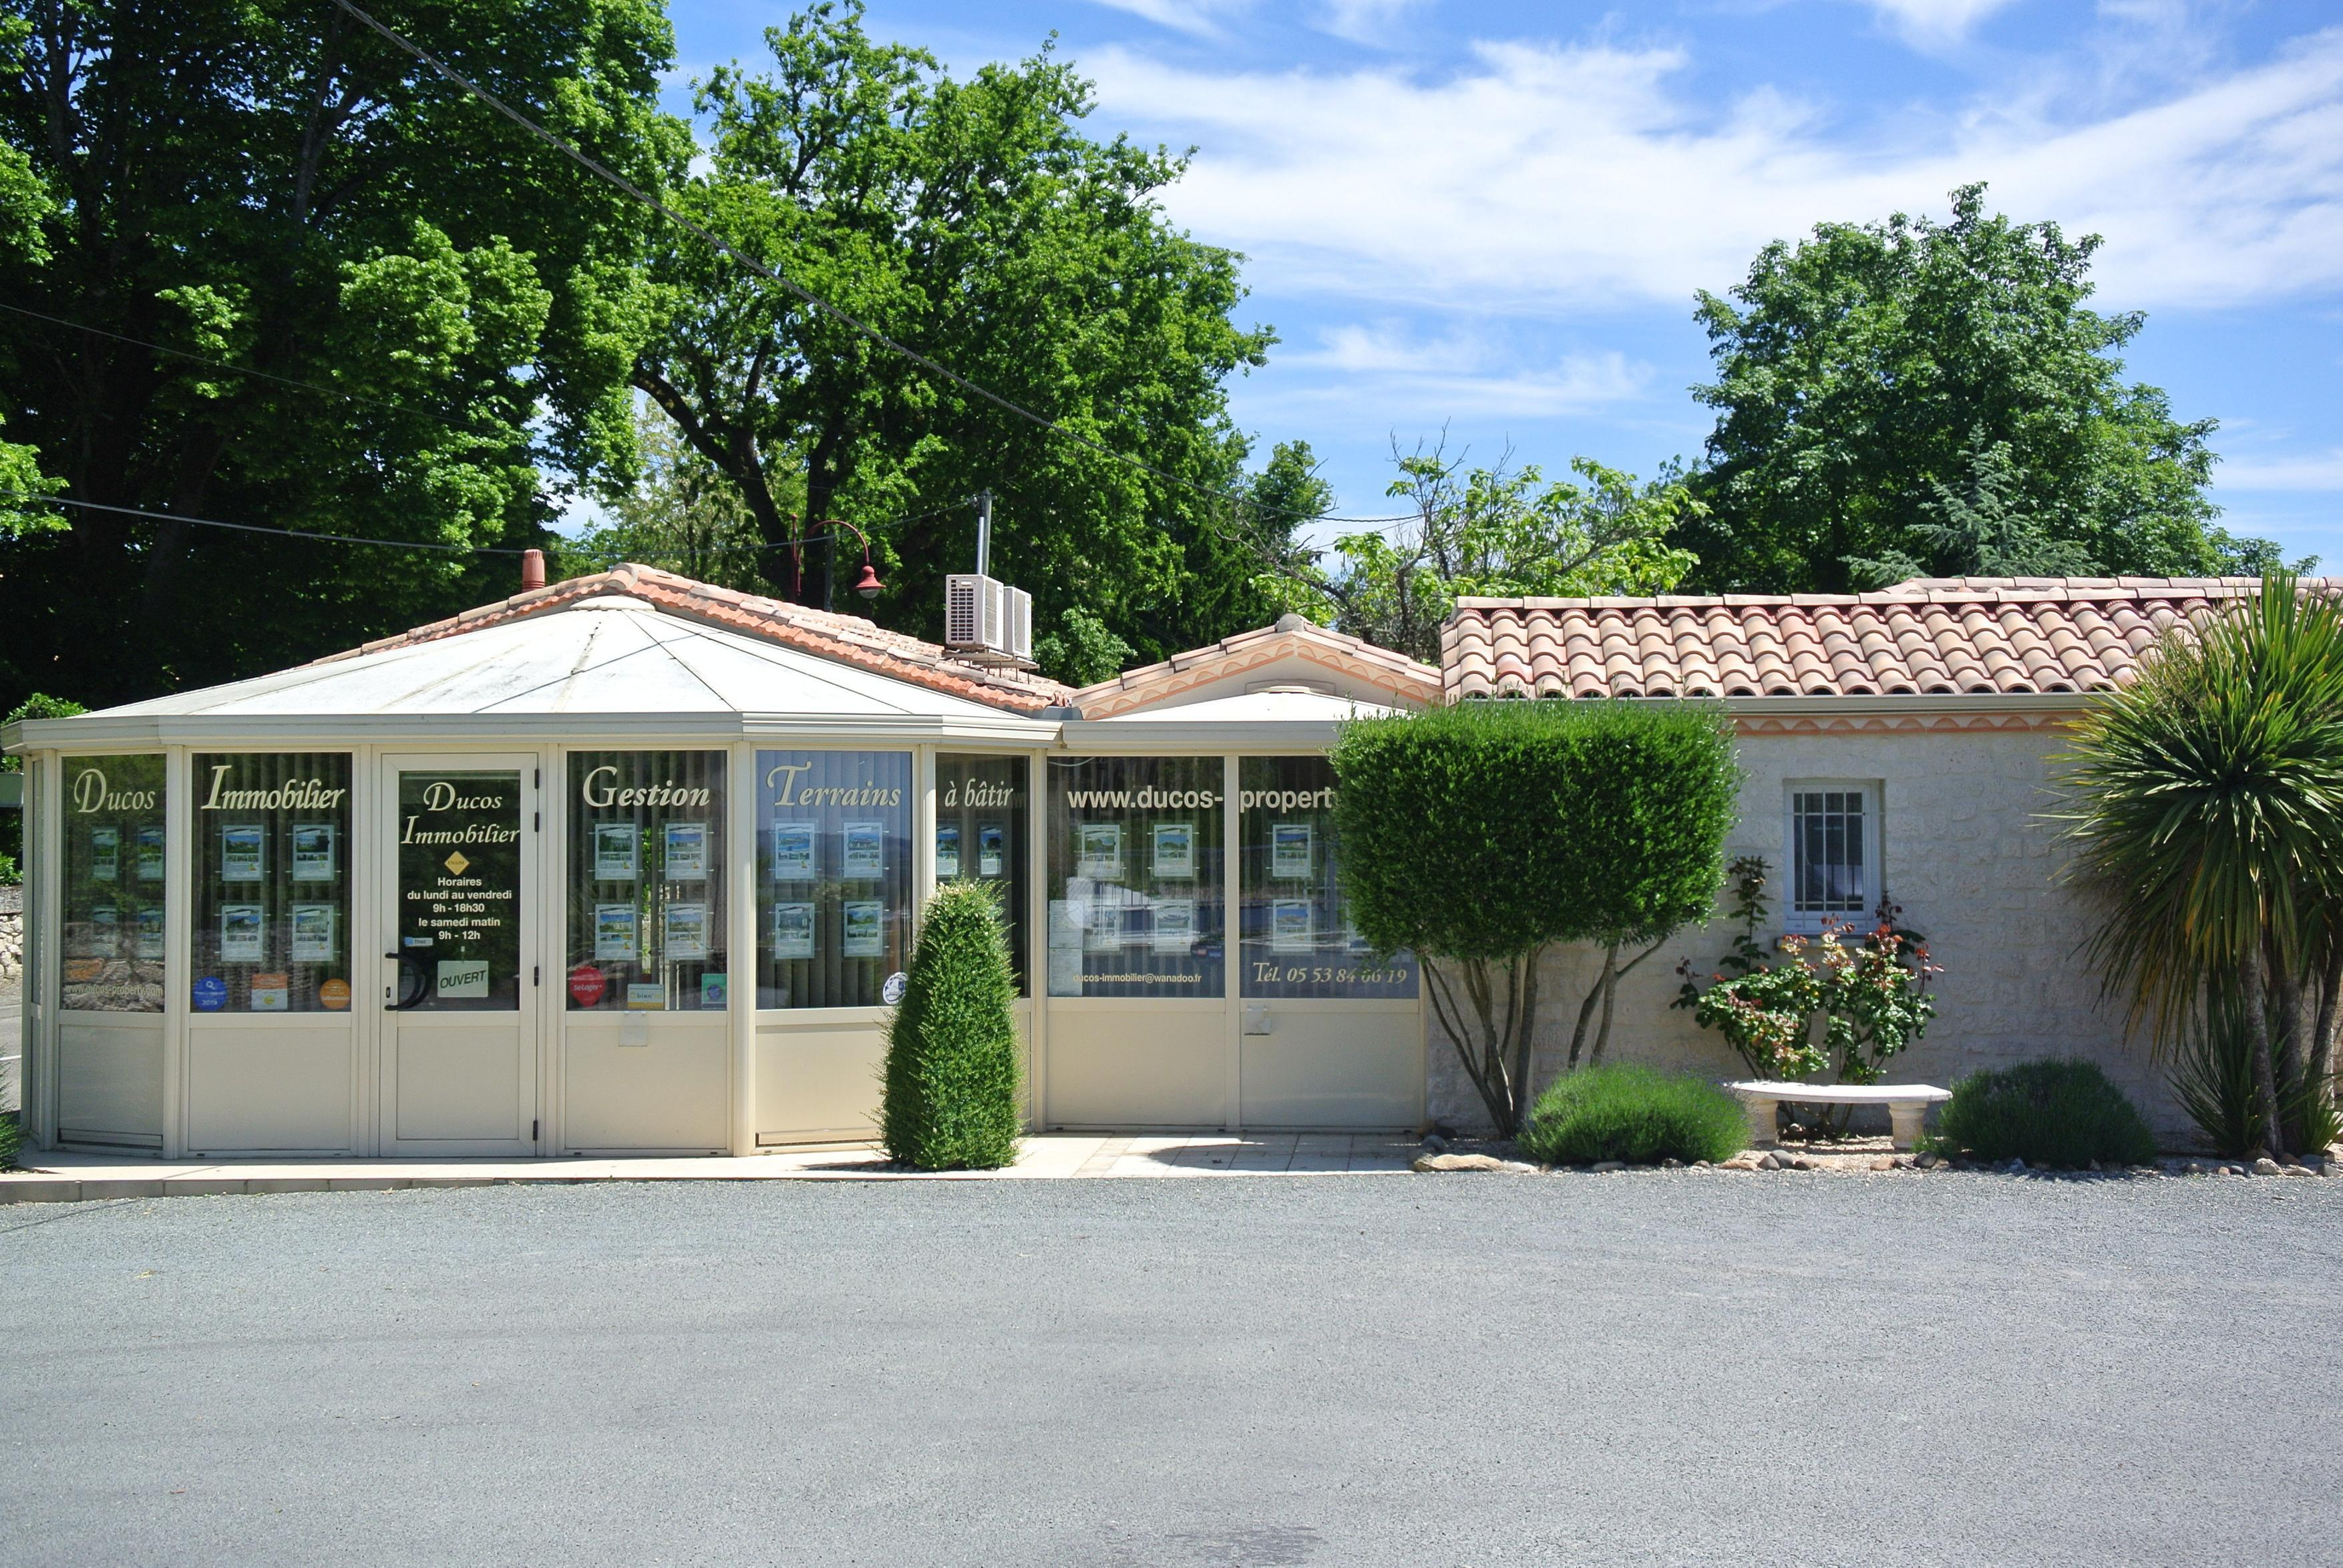 DUCOS IMMOBILIER agence immobilière Marmande (47200)